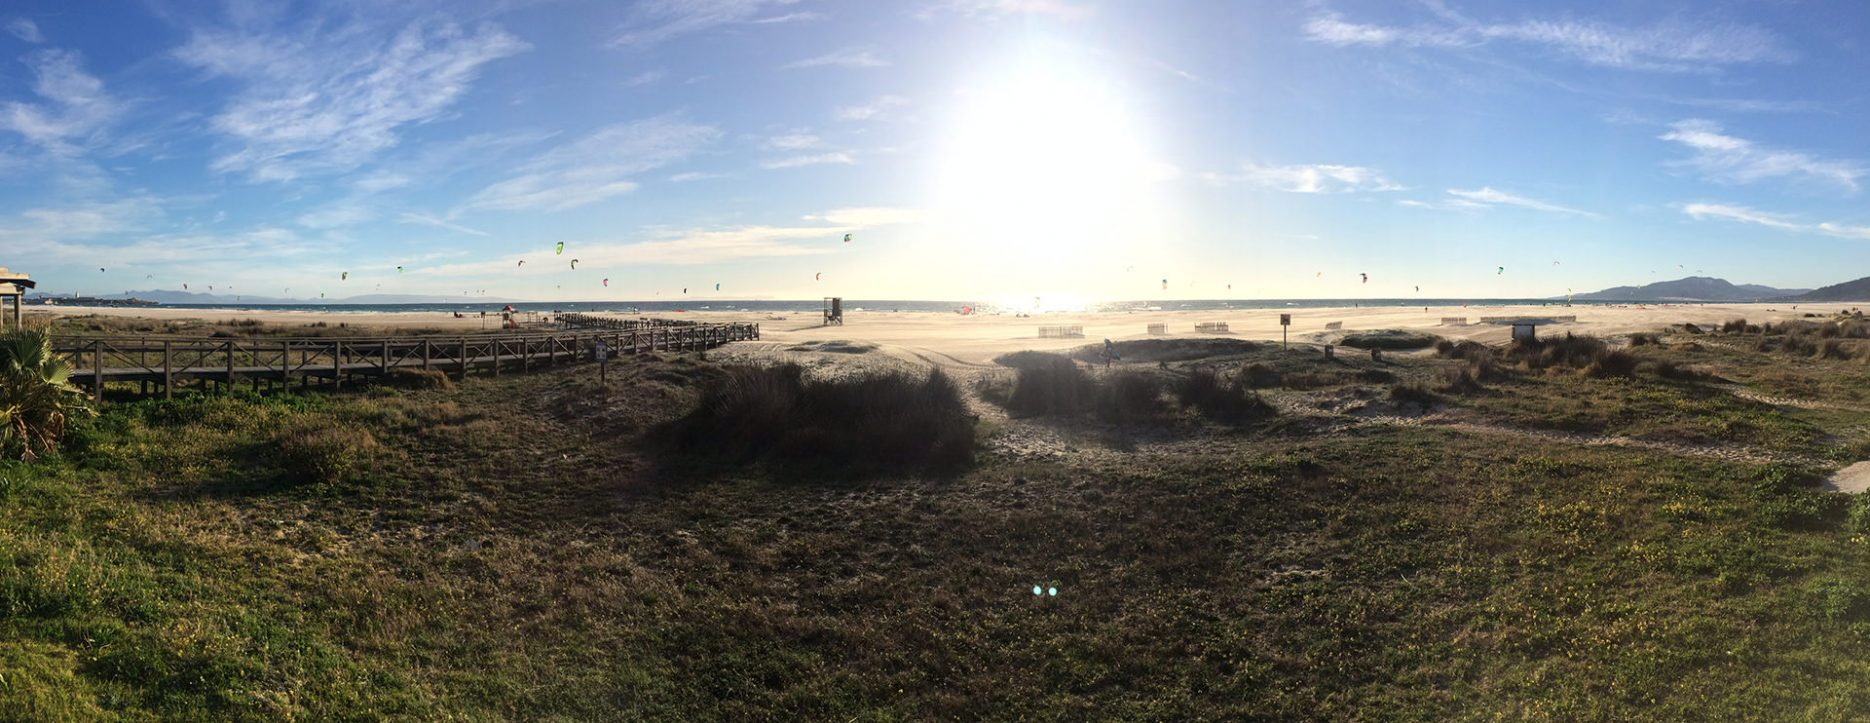 #Kite #Beach - #Tarifa #Spain - Feb 2015